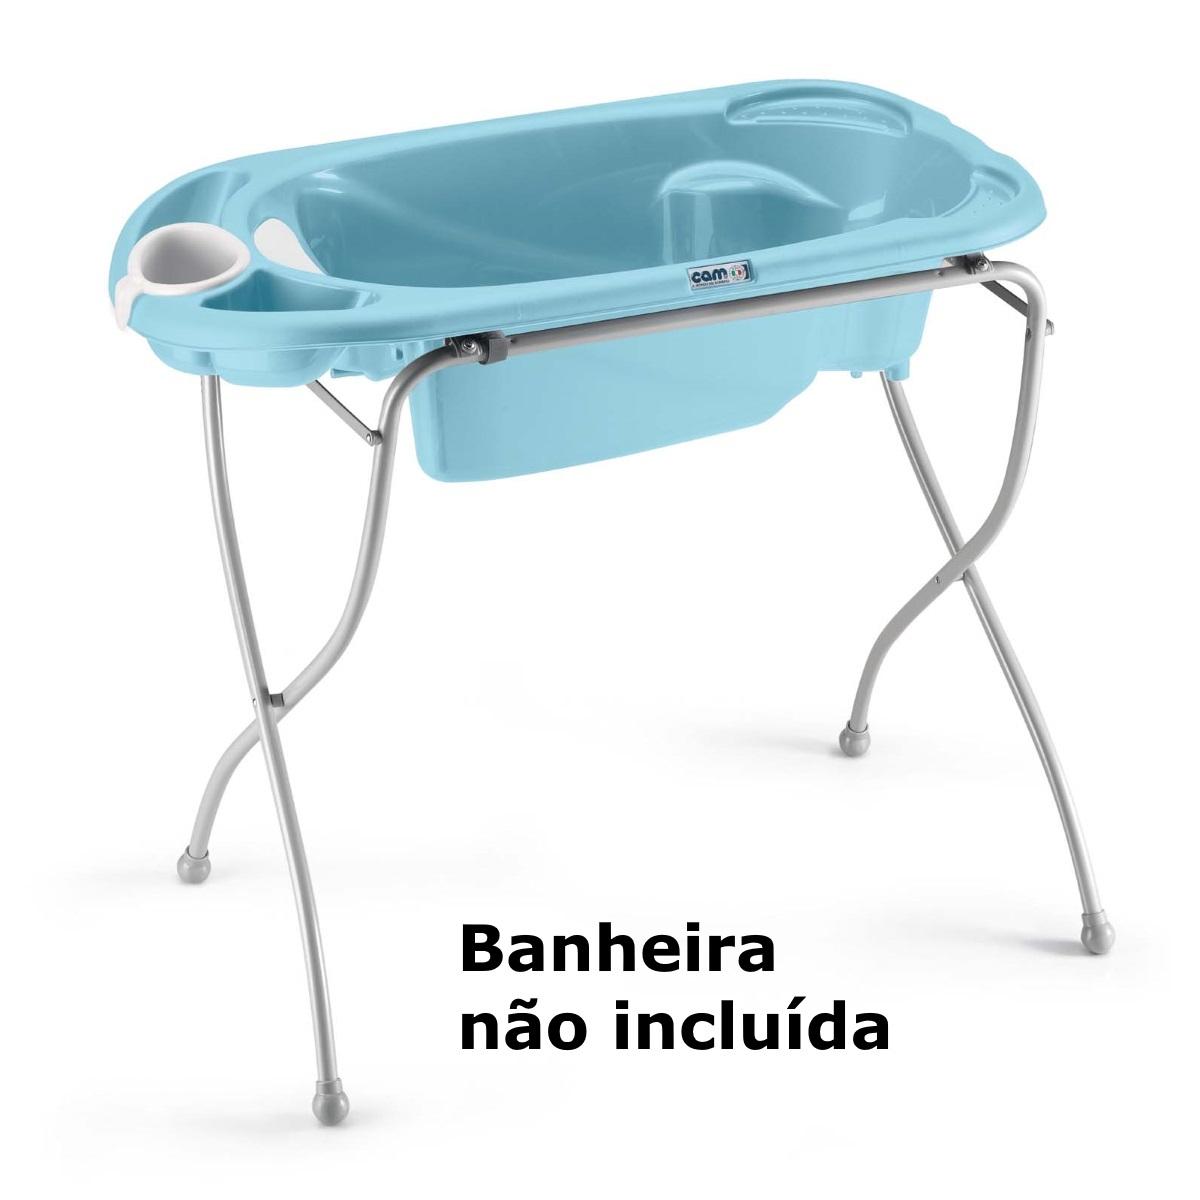 Banheira CAM Baby Bagno Bathtub